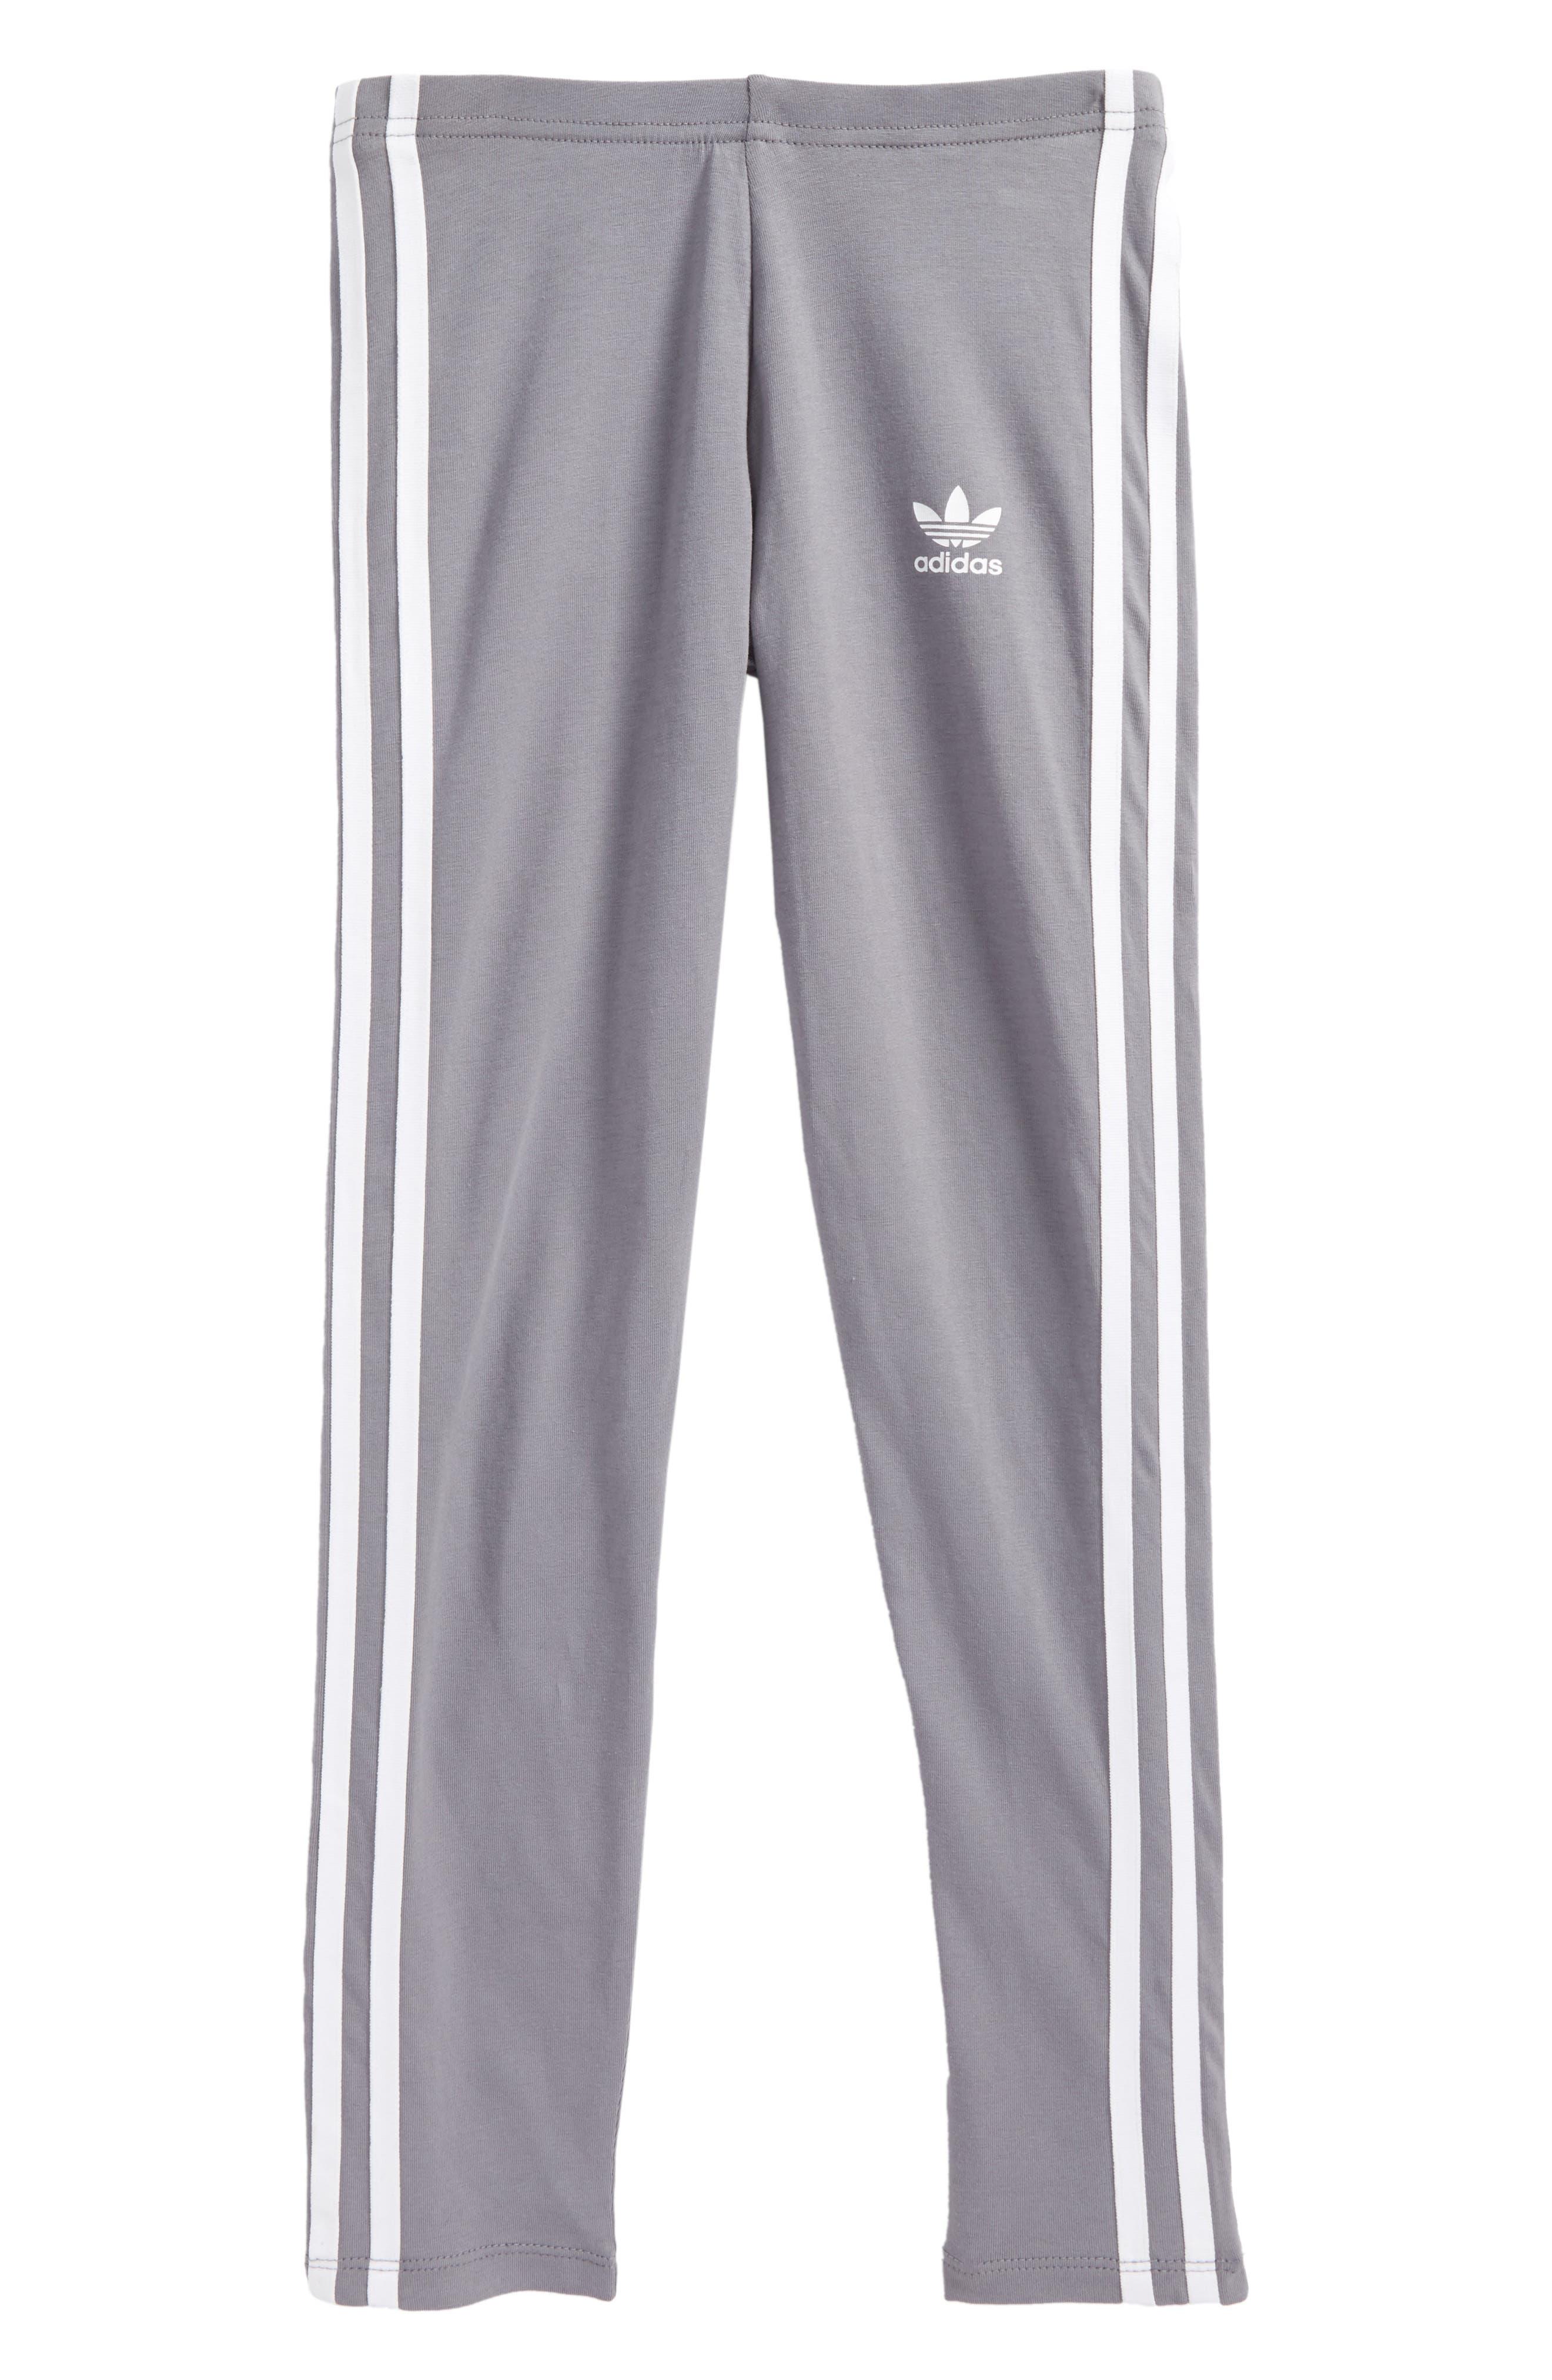 adidas 3-Stripes Leggings,                         Main,                         color, Grey